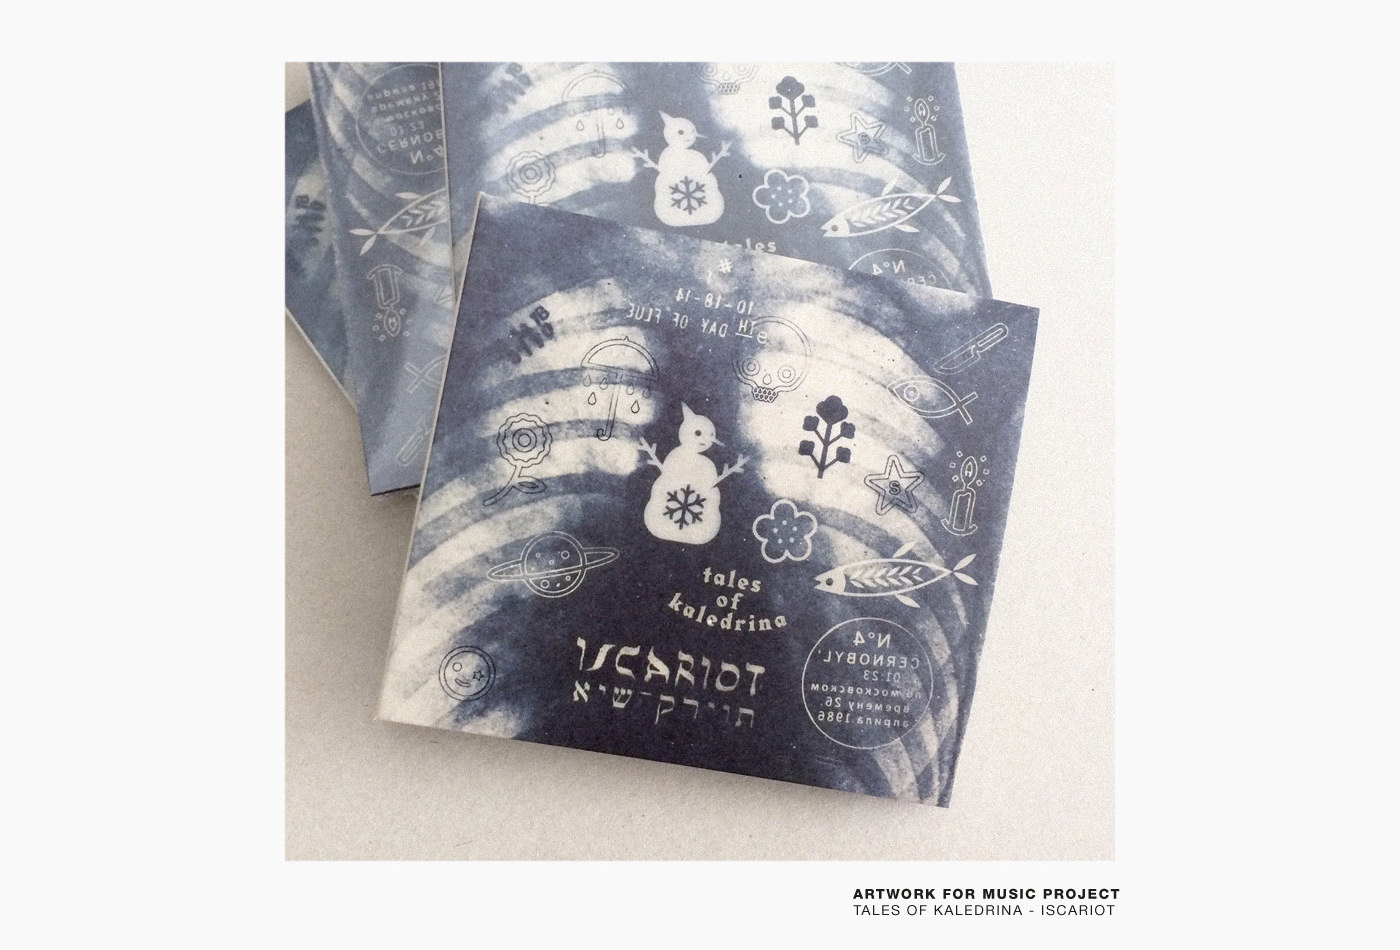 tales-of-kaledrina--music-vacaliebres-artwork-symbols-cd-album-marks